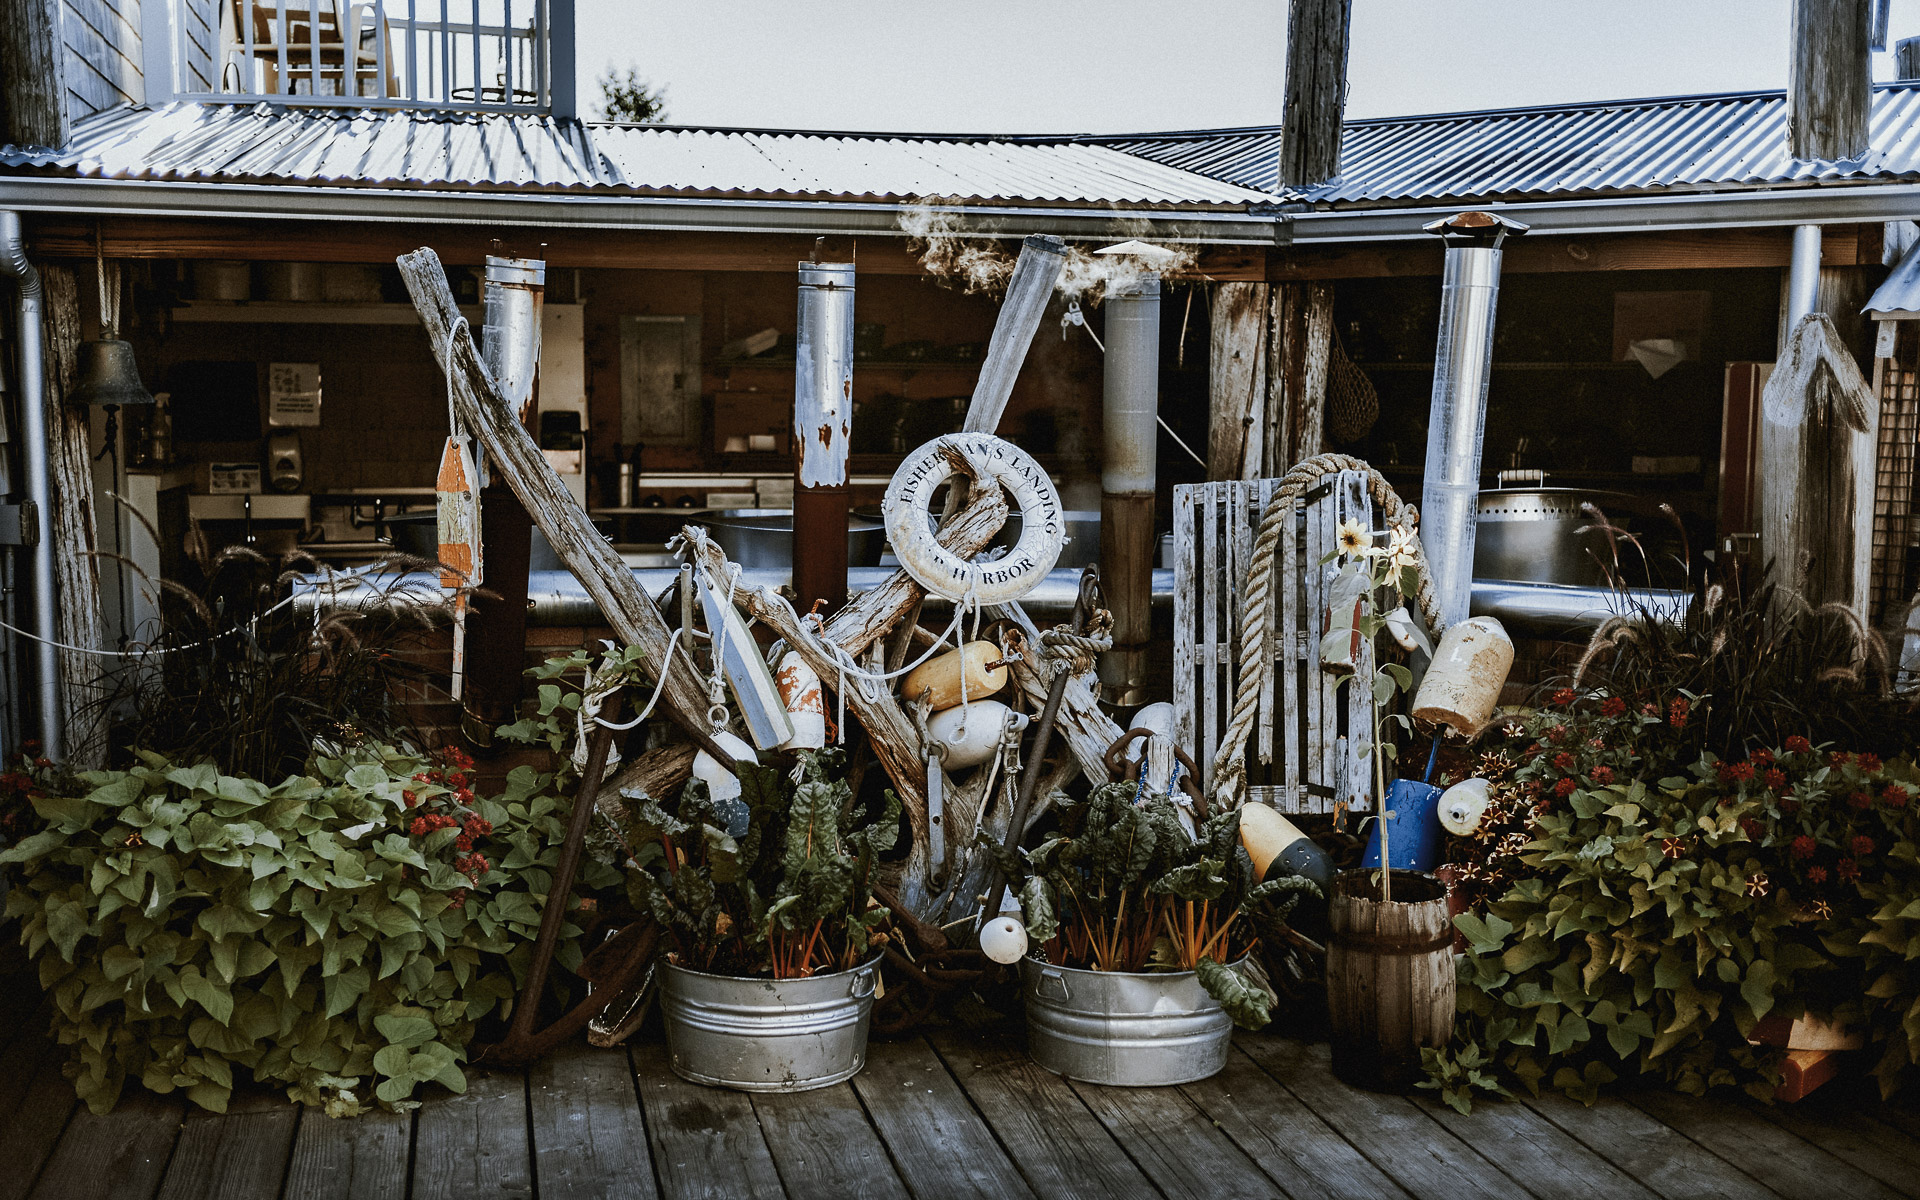 Twisted-oaks-studio-maine-bar-harbor-2019-7.jpg